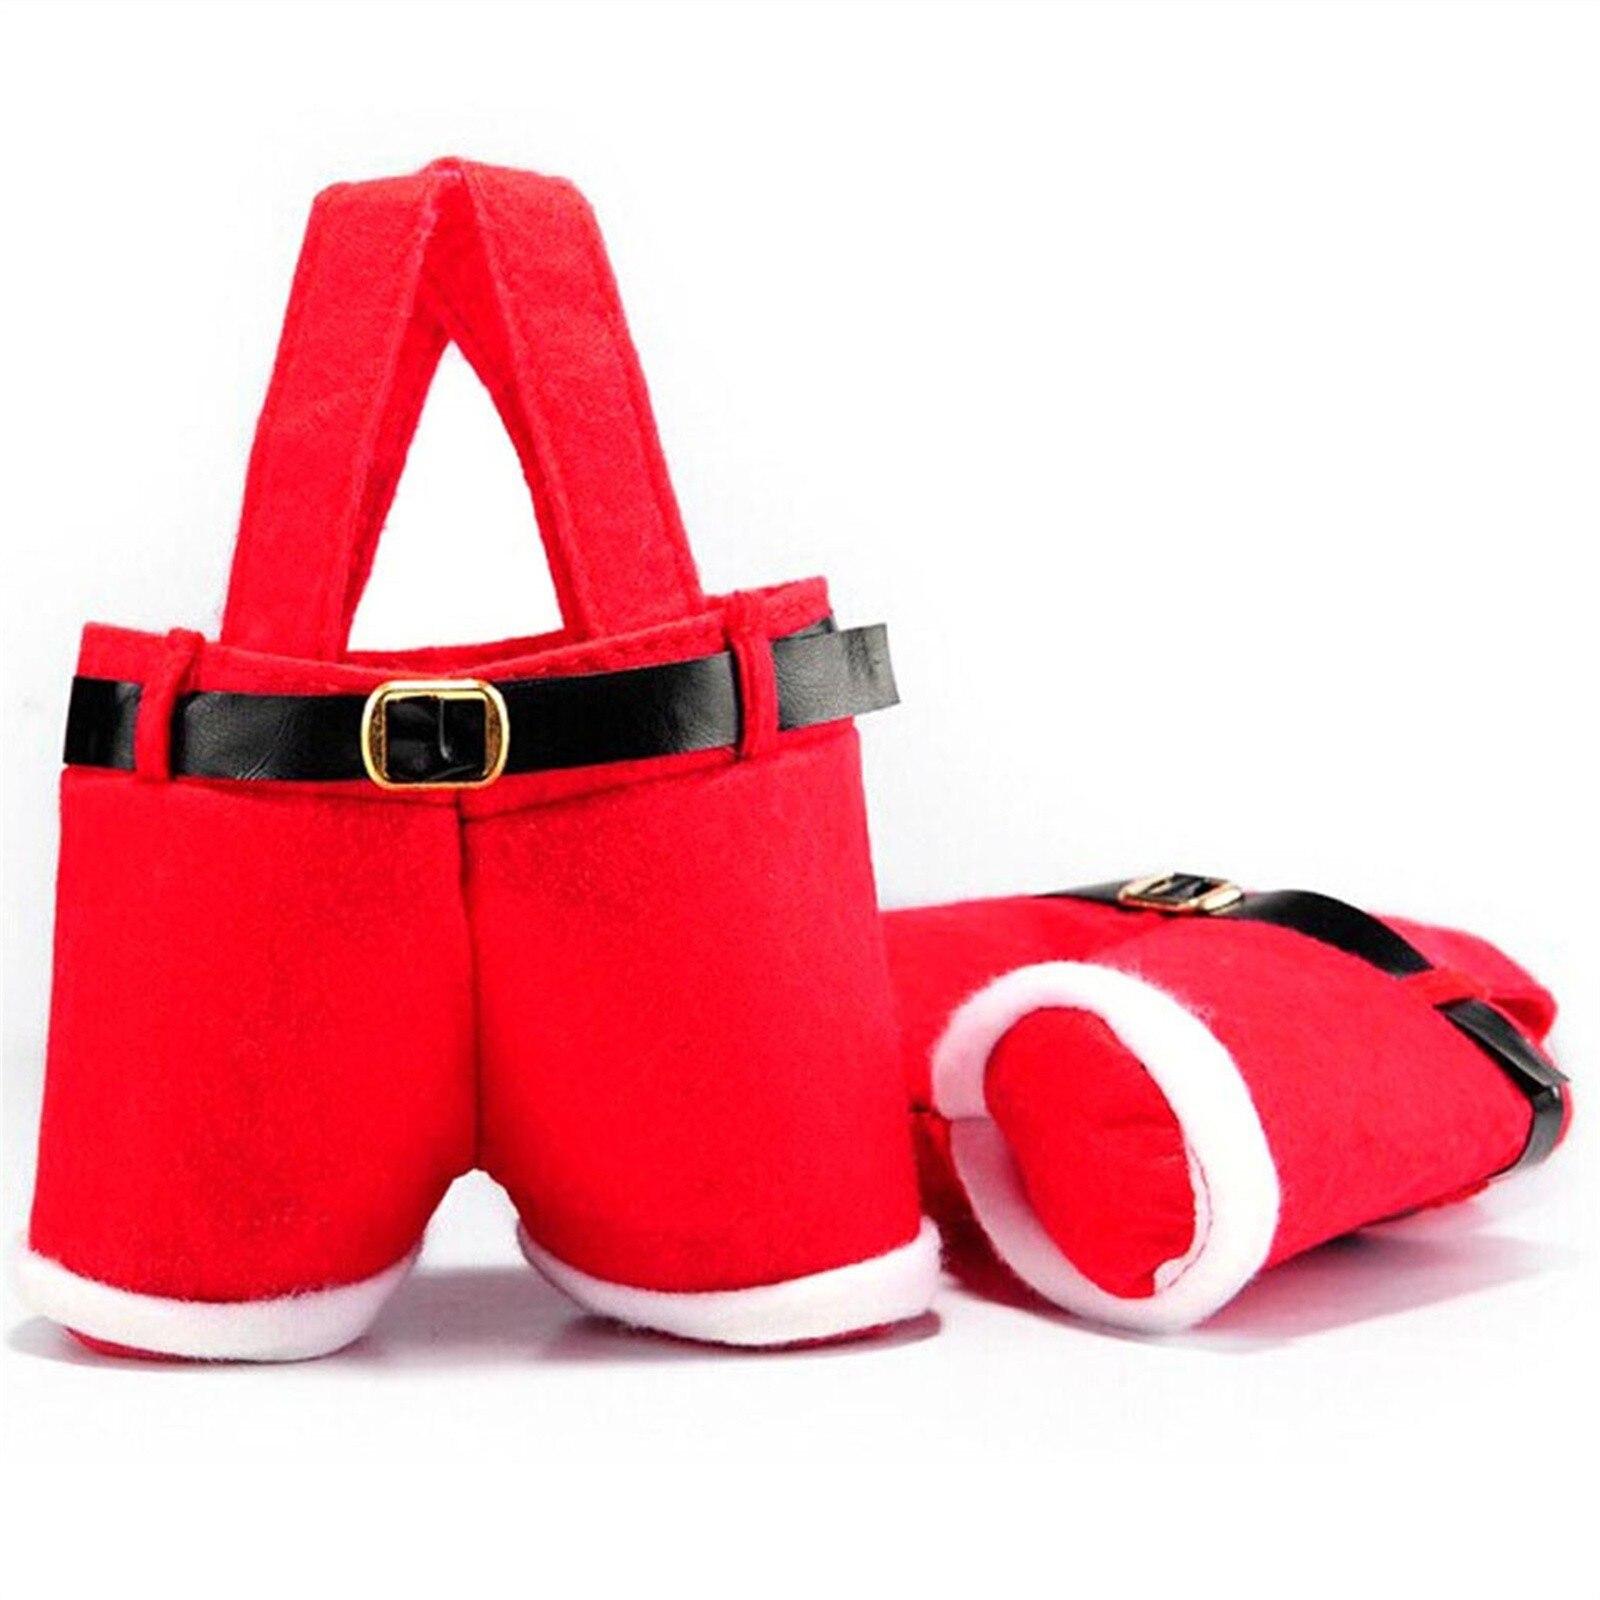 Bolsa De regalo De Navidad, bolsa Para golosinas De boda, decoración De...